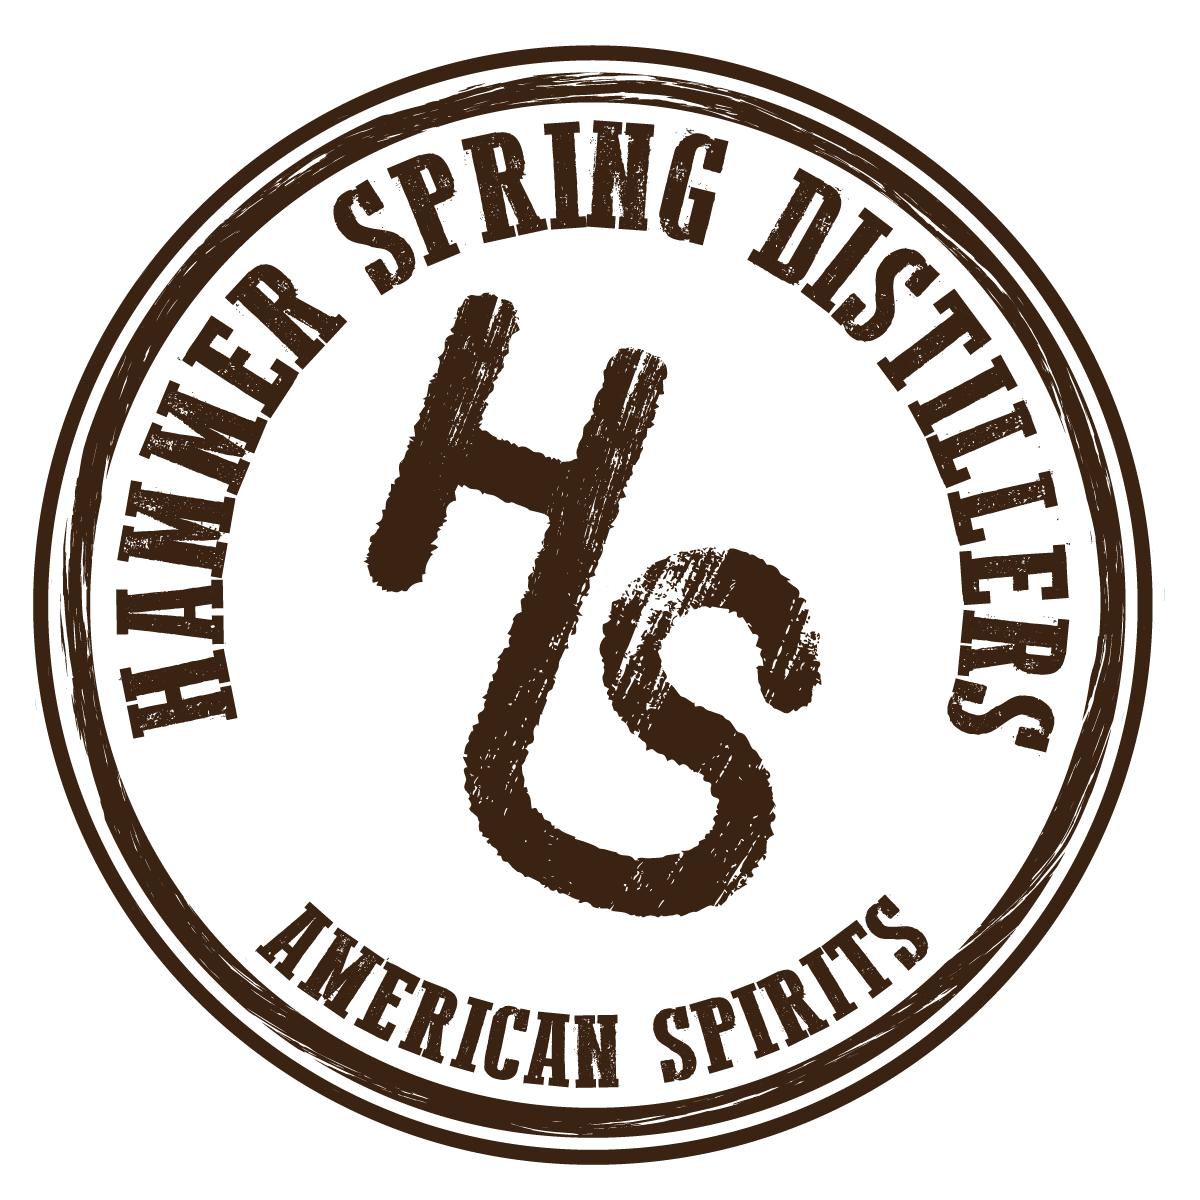 Hammerspring Distillers